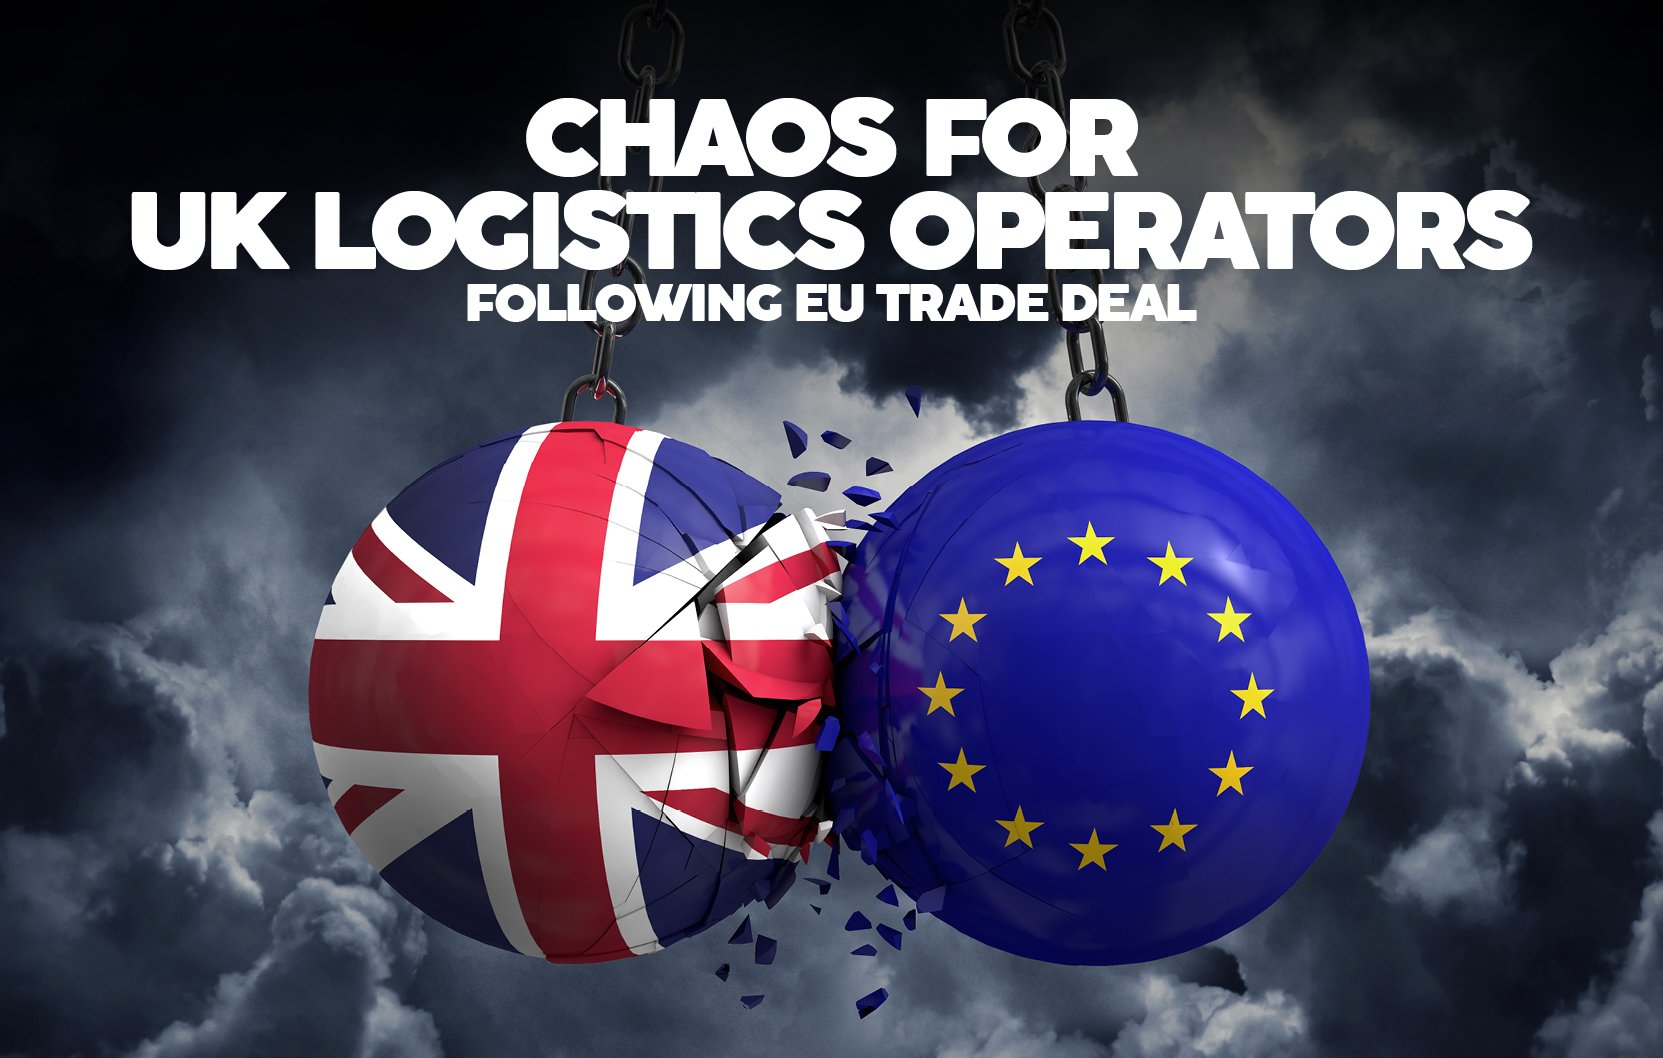 CHAOS FOR UK LOGISTICS OPERATORS FOLLOWING TRADE DEAL